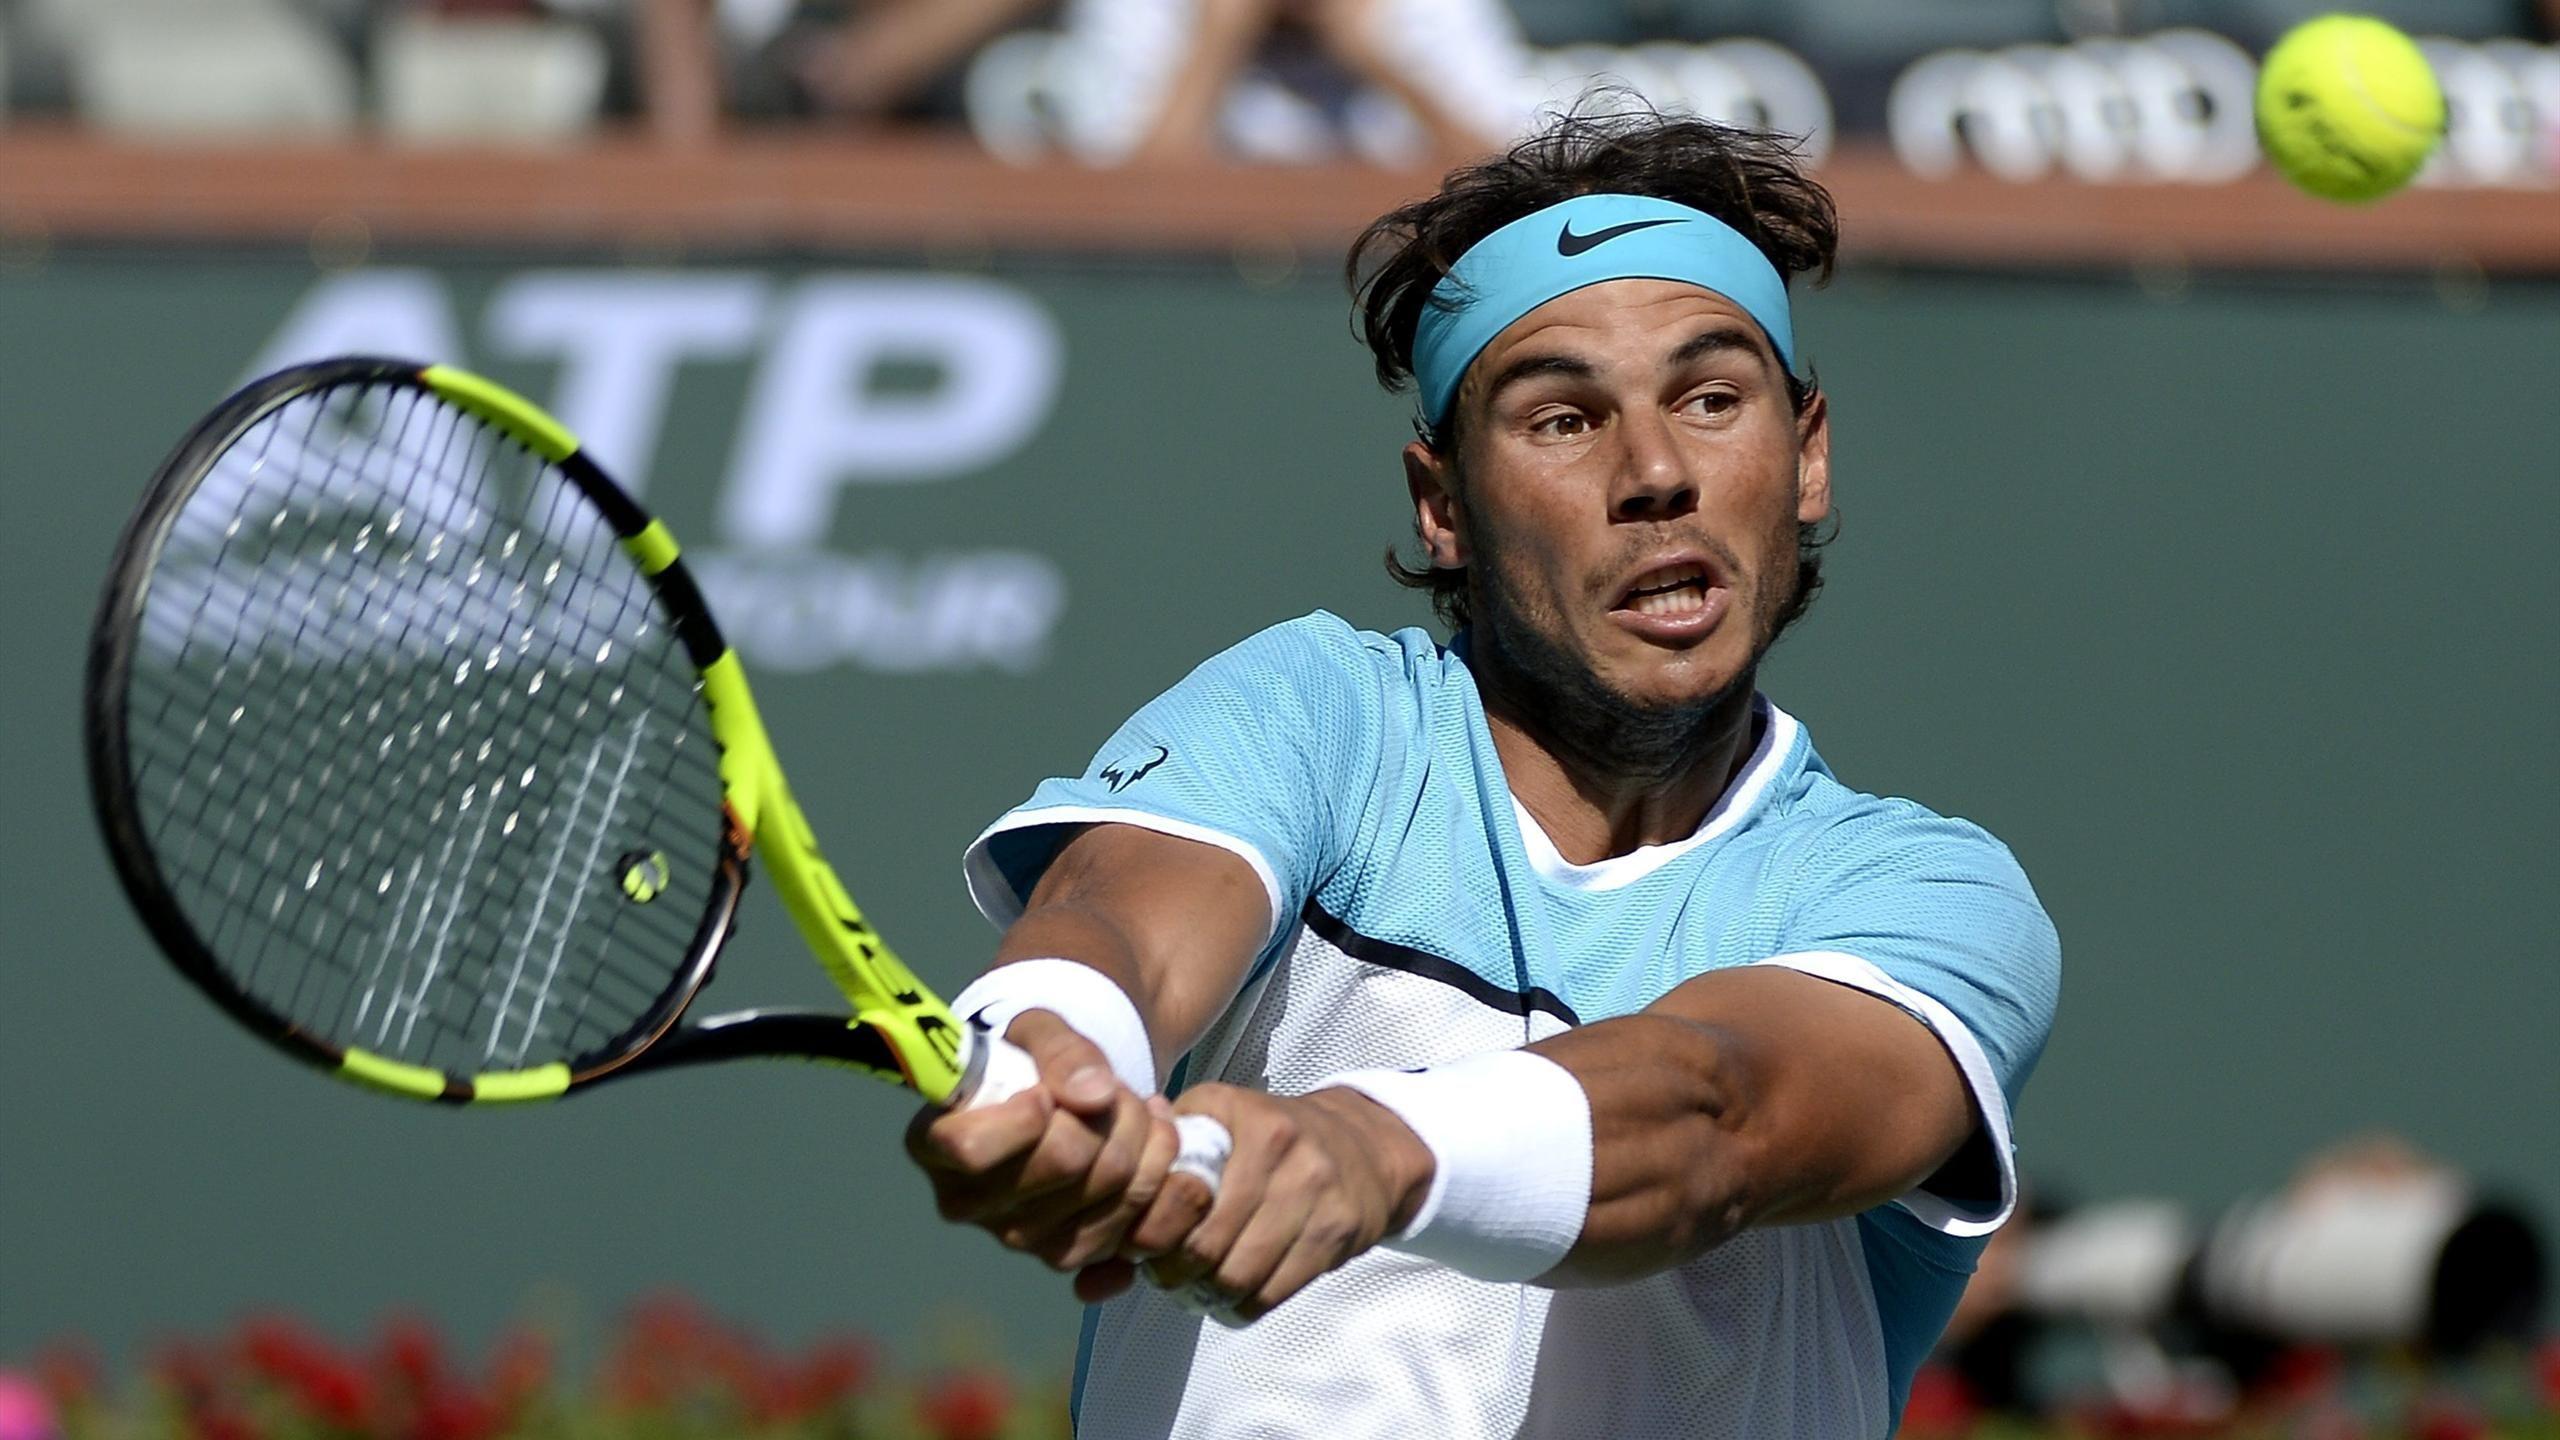 Un gran Nadal tutea a Djokovic pero termina cayendo en la semifinal en Indian Wells